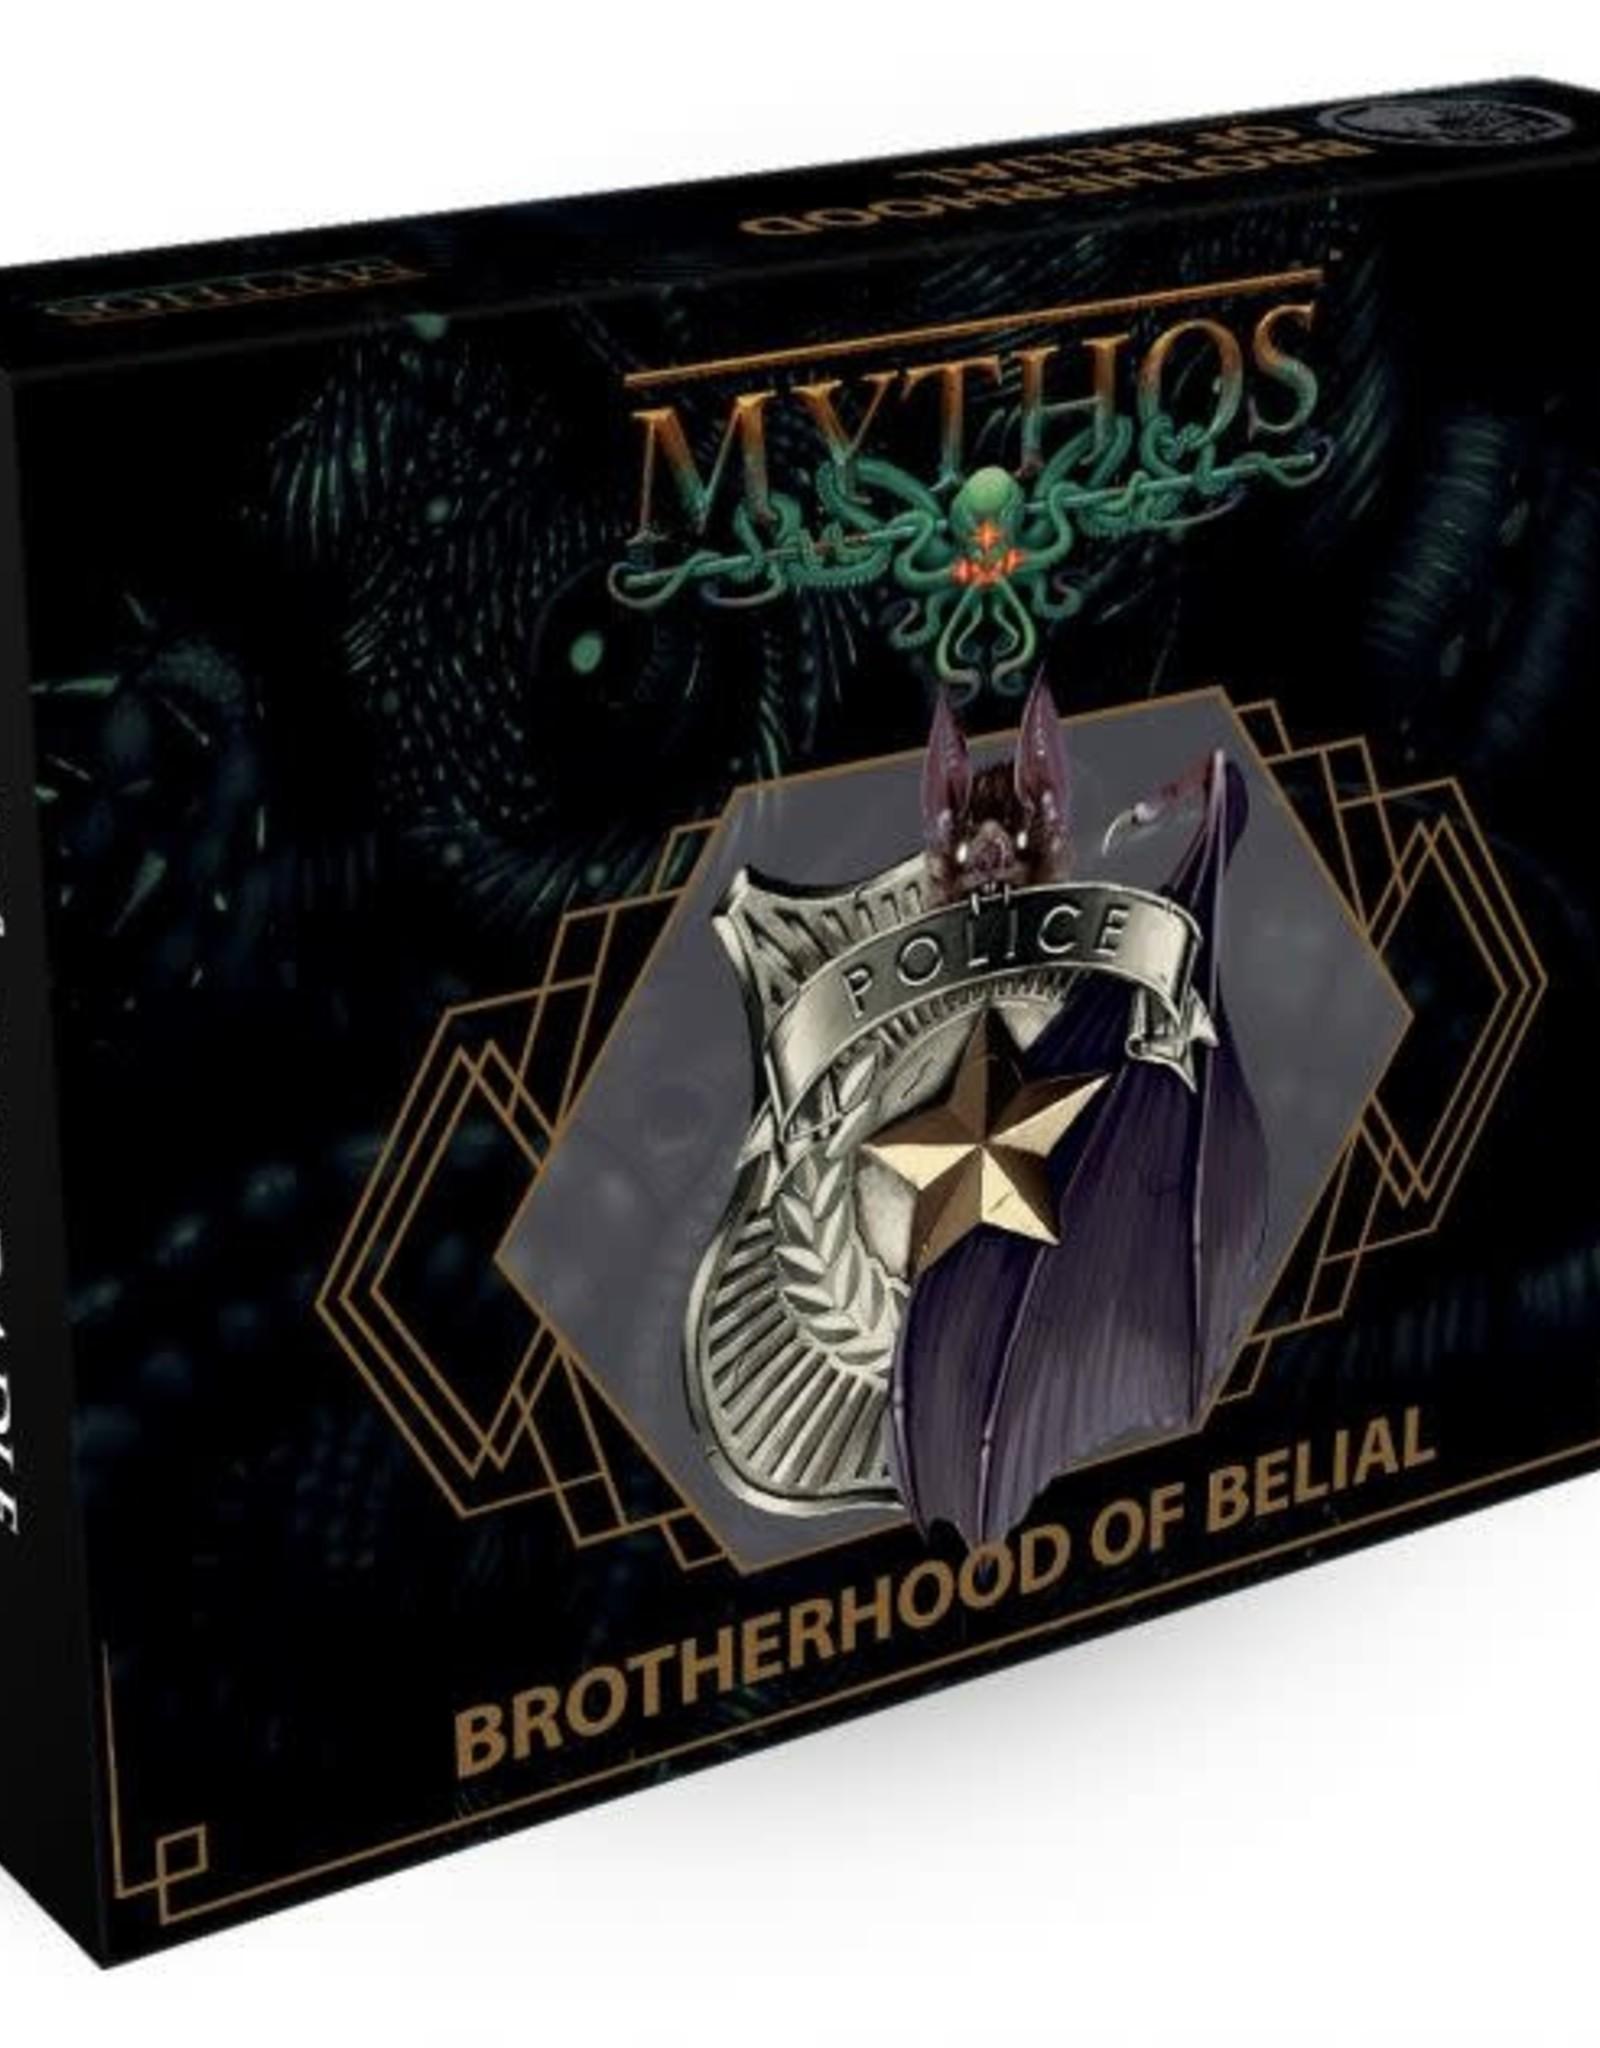 Brotherhood of Belial